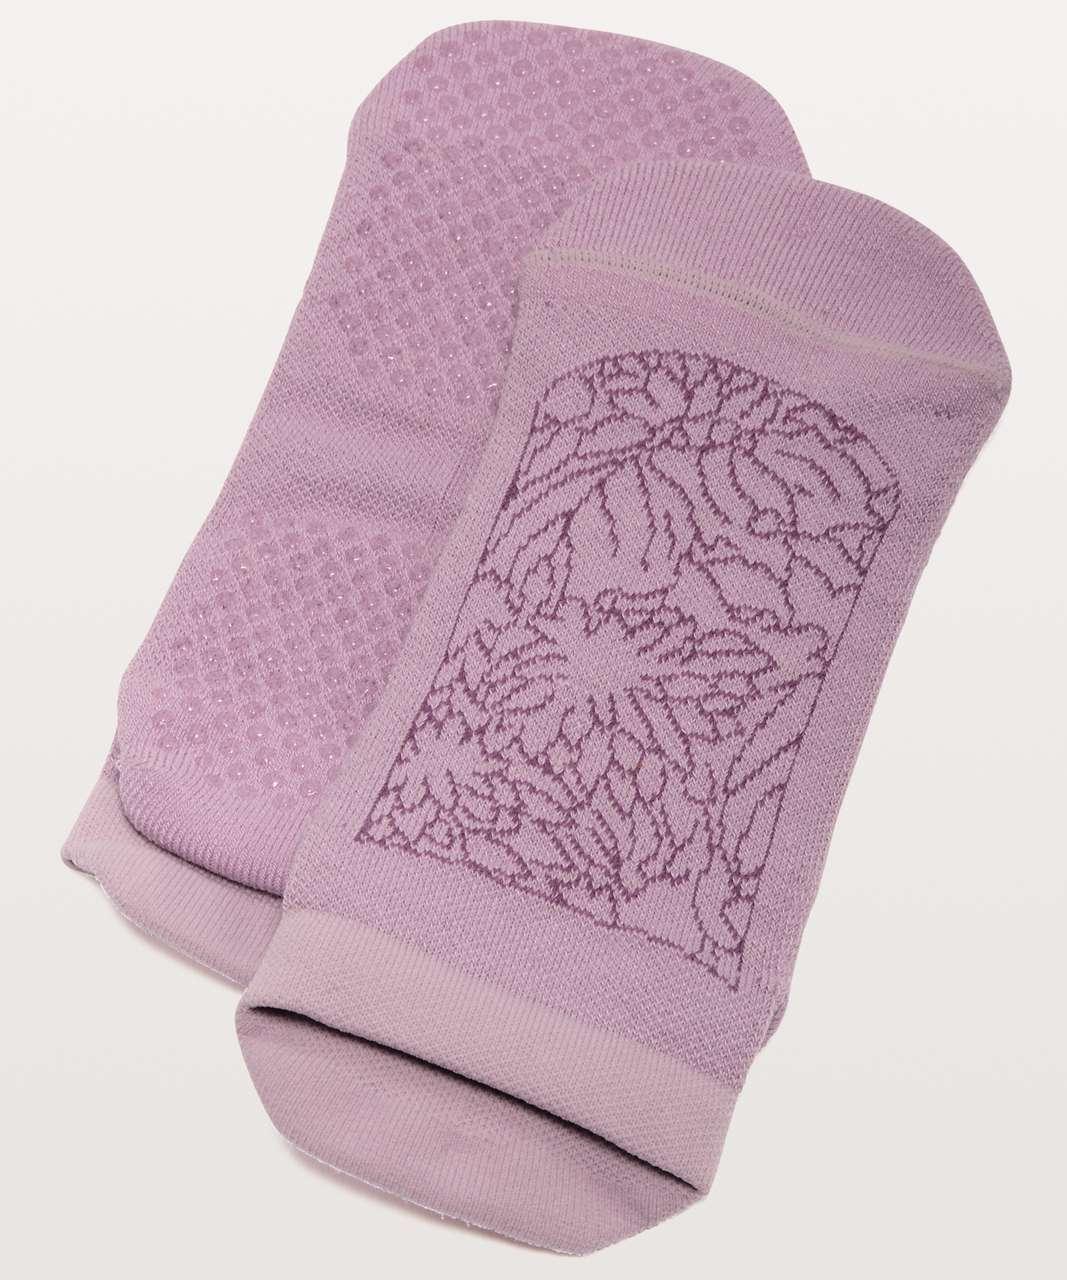 Lululemon Get A Grip Sock - Antoinette / Vintage Plum